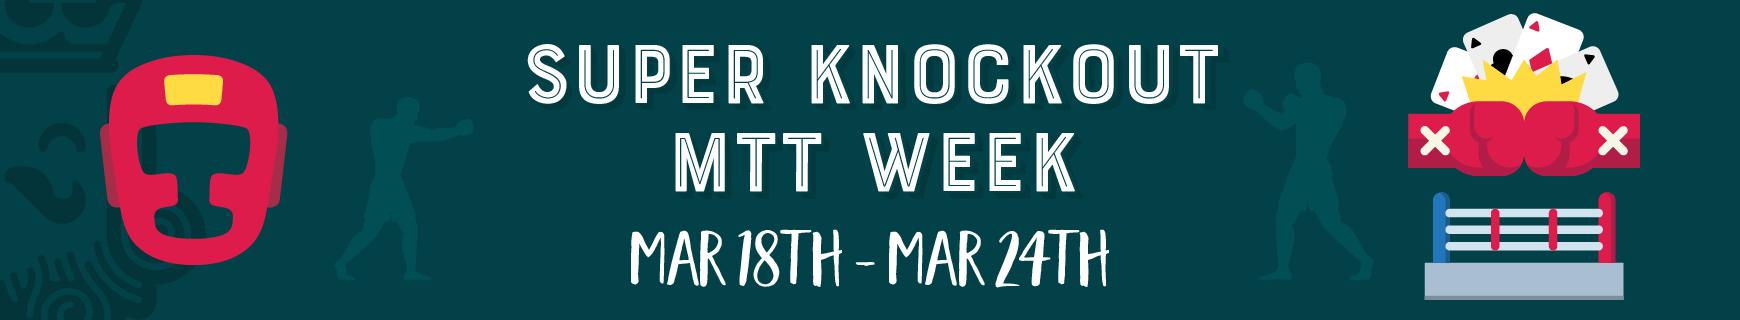 Super knockout mtt week %28870 x 160%29 2x